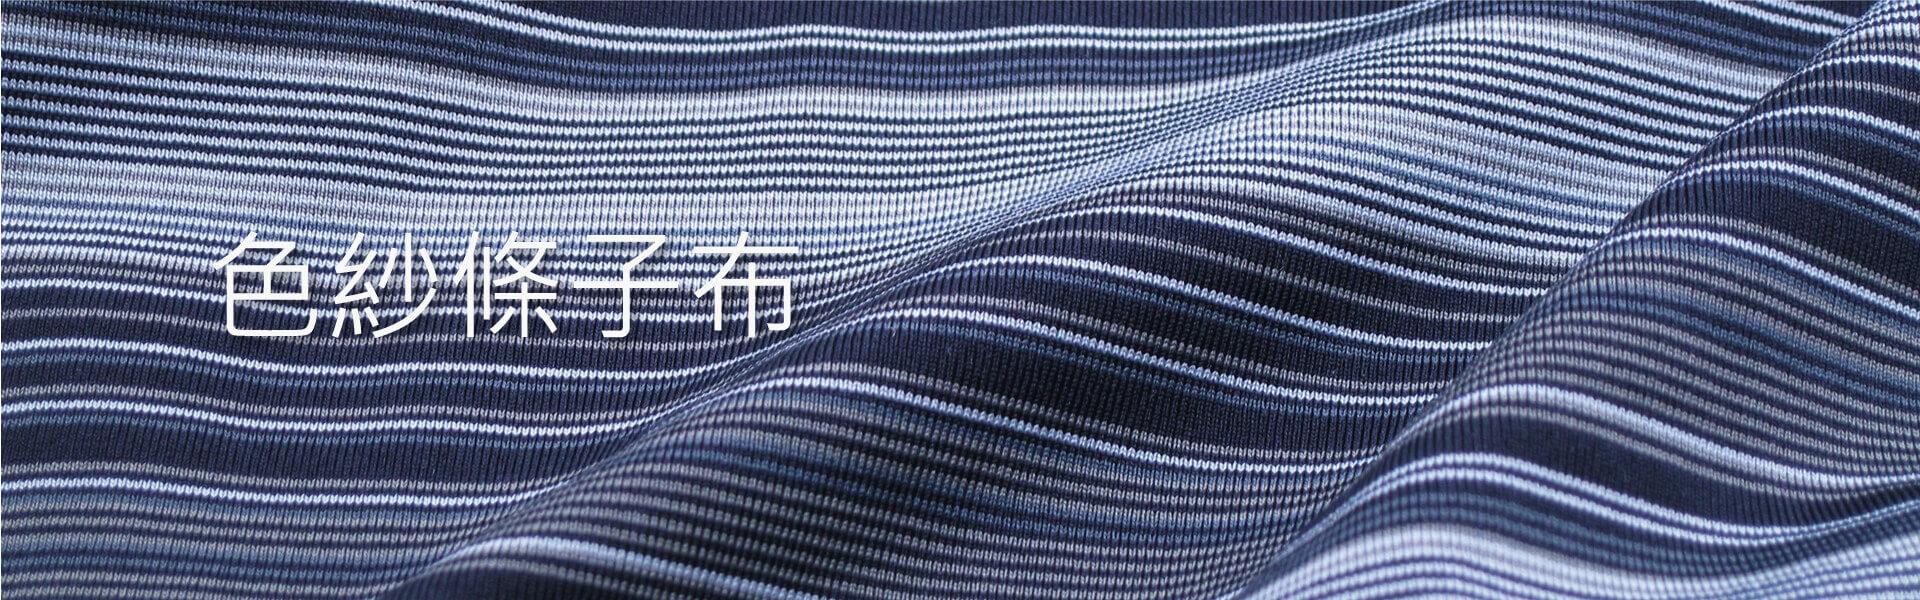 yarn-dyed-stripe-zh